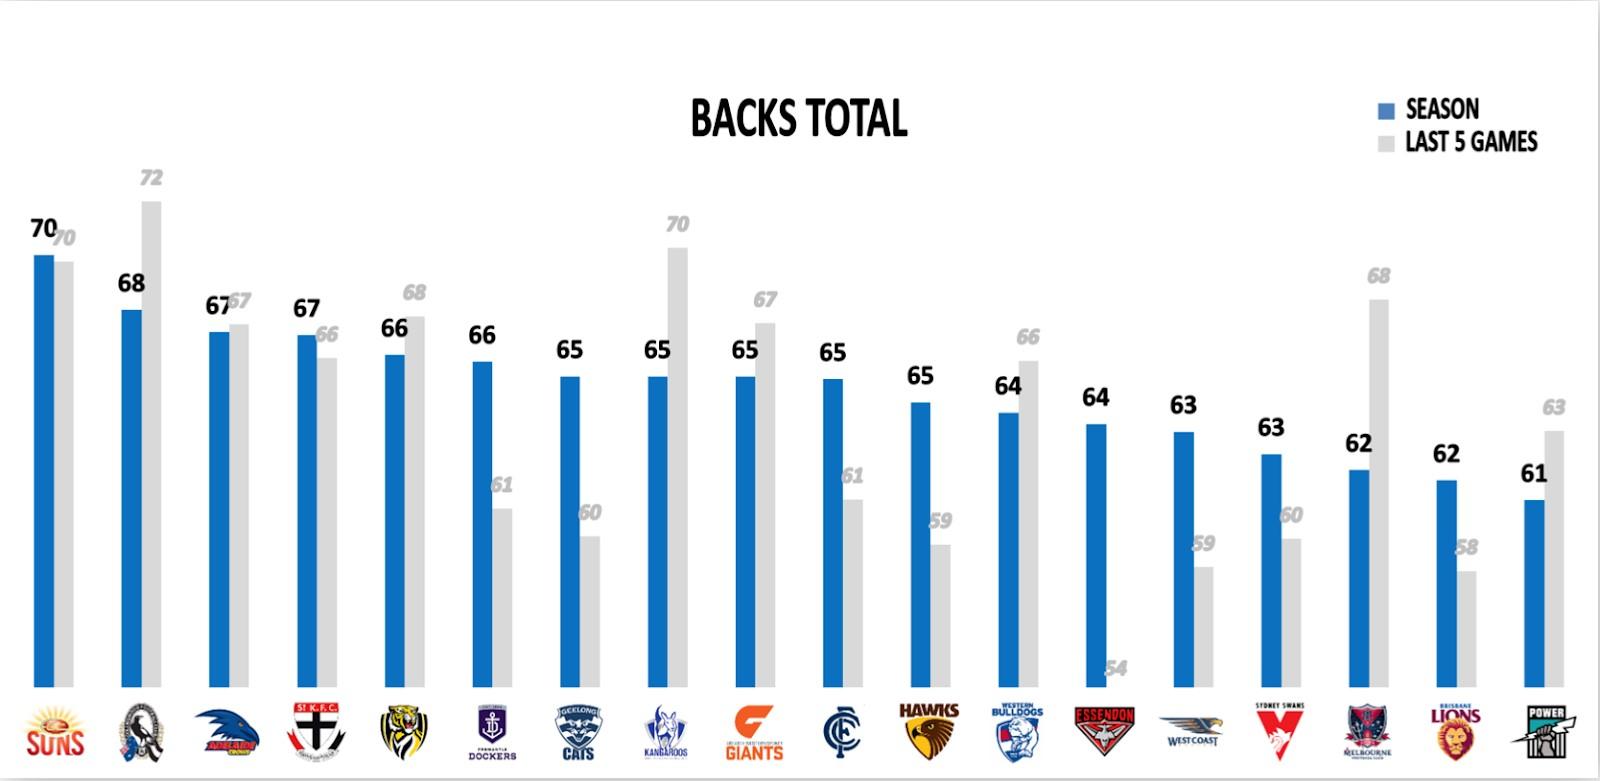 Points Against - Backs